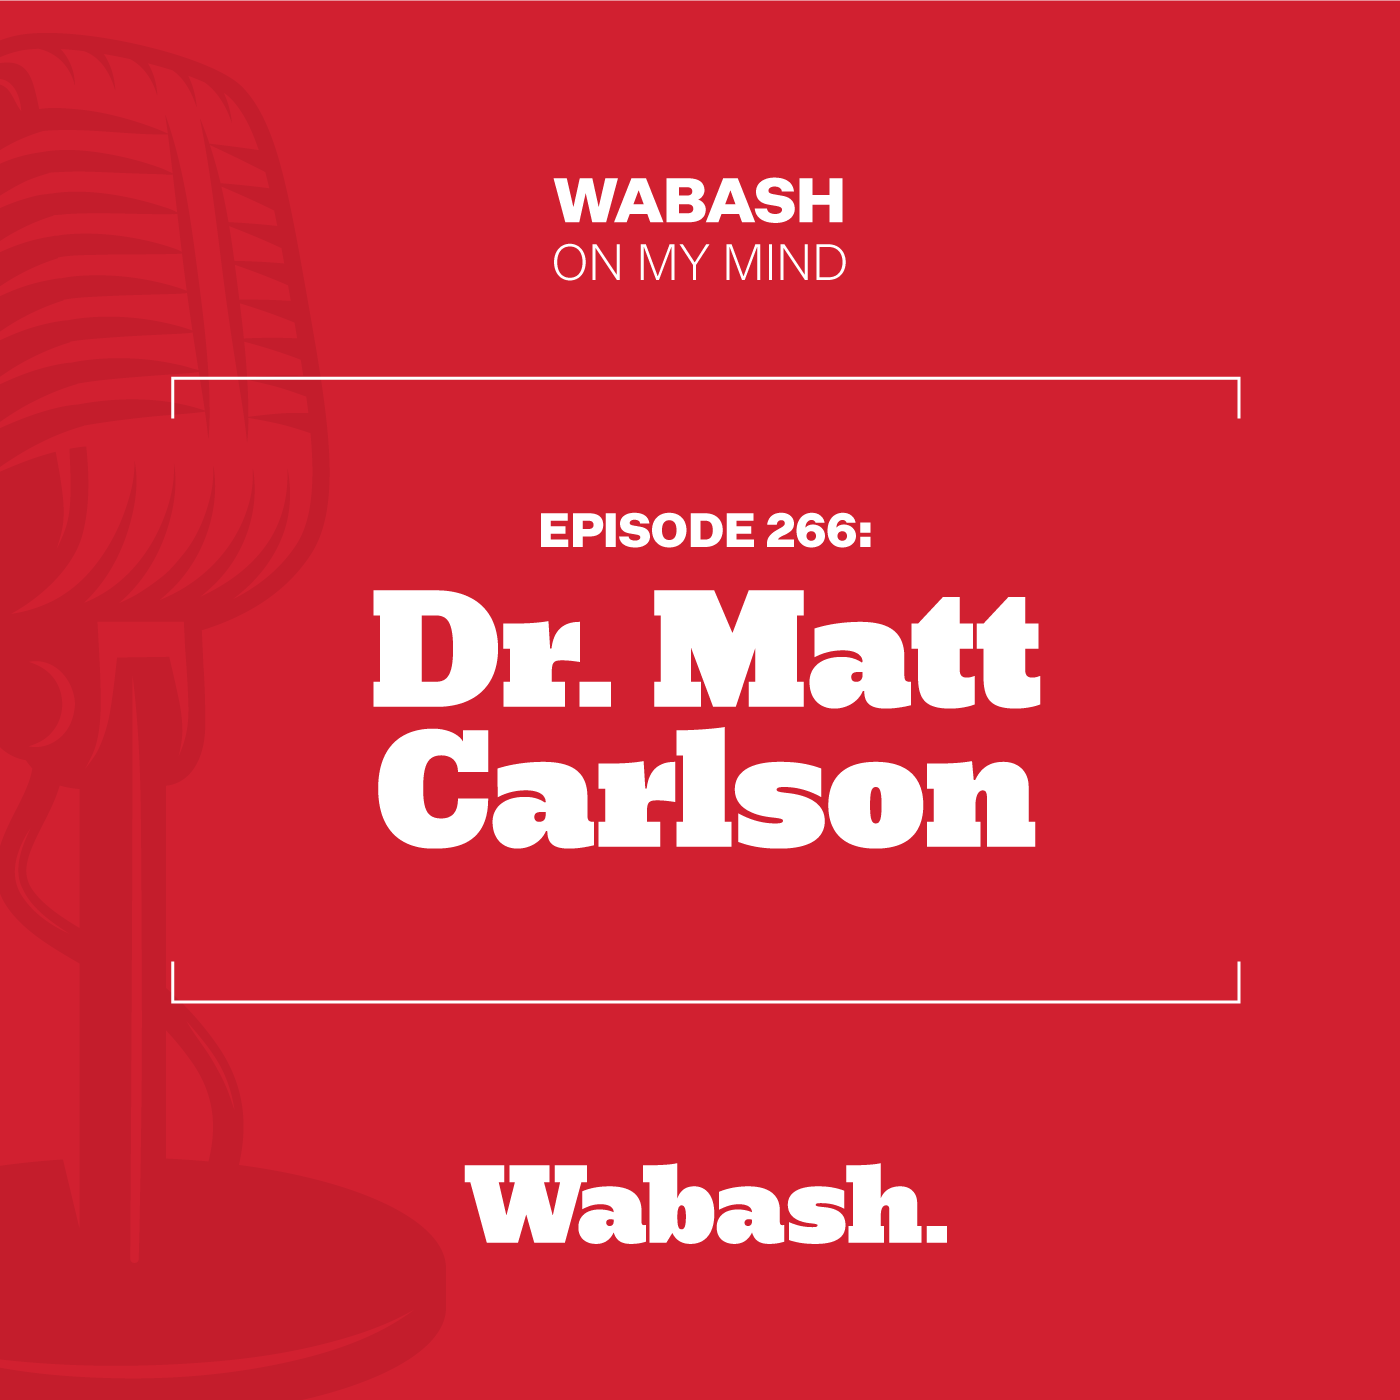 #266: Dr. Matt Carlson